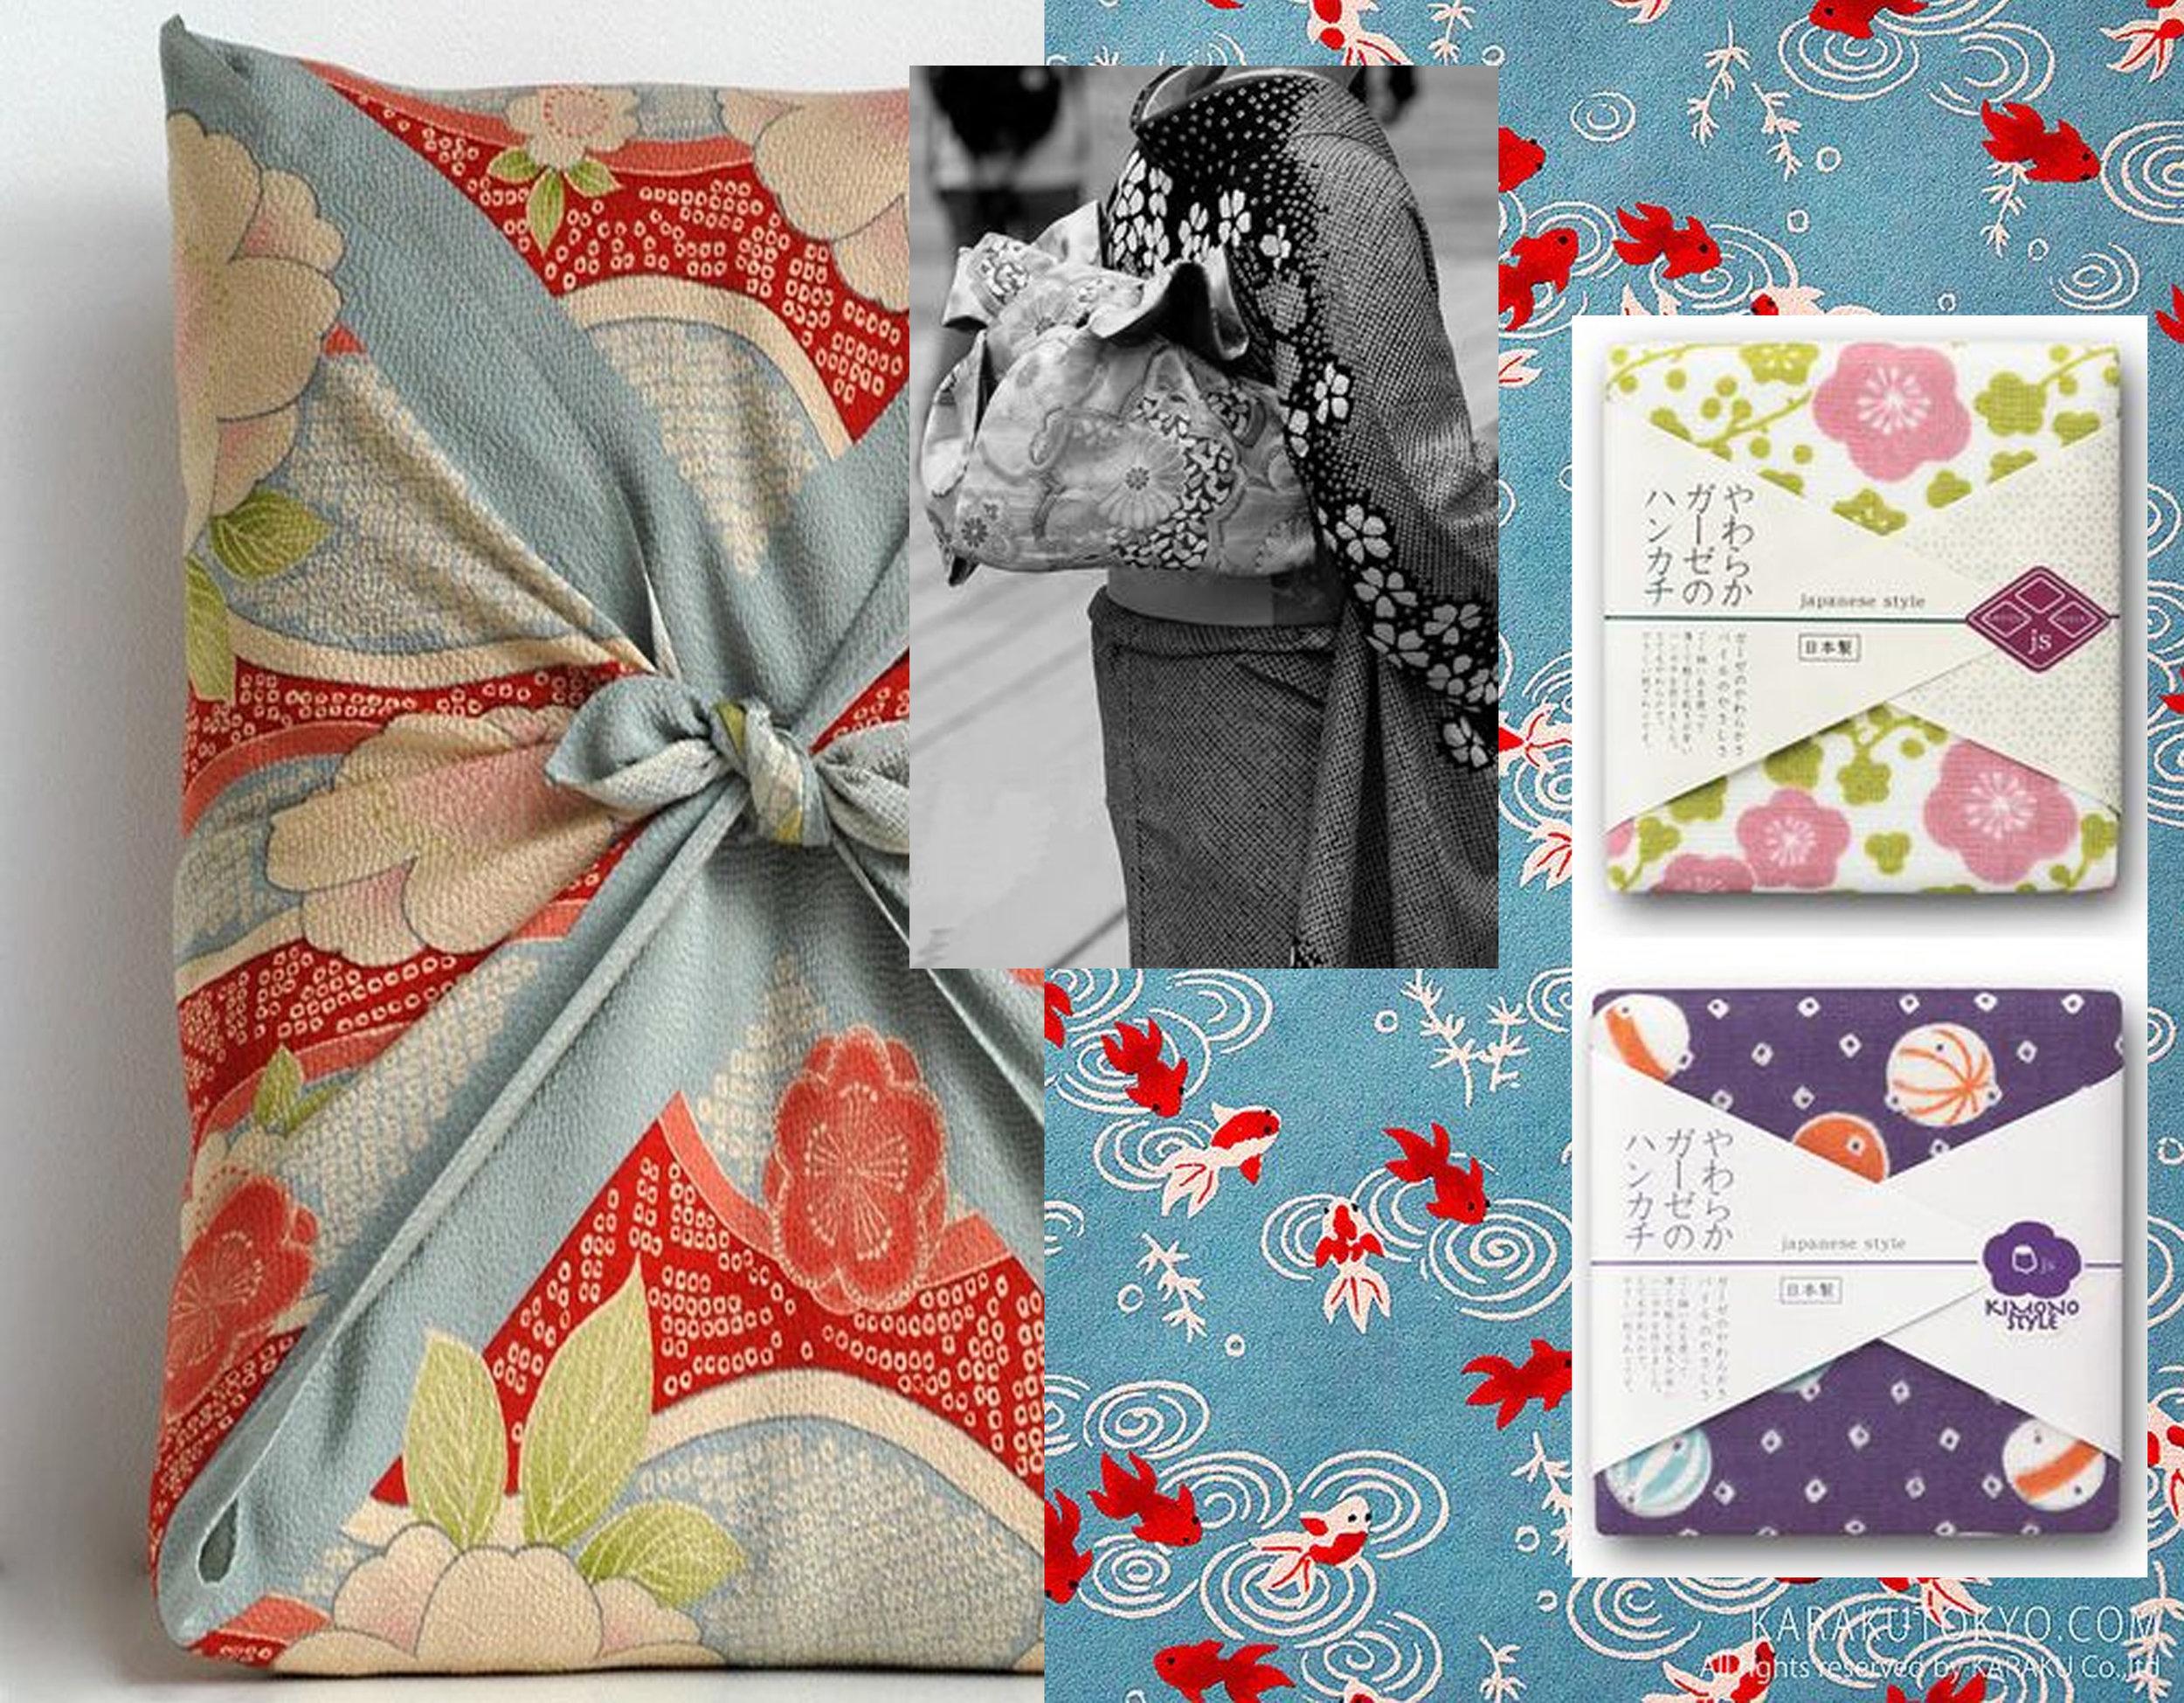 Japanese textile wrapping via  Tokyo Pic  - Japanese style packaging via  MYA  - printed paper via  Flickr  - kimono via  Kikikimono